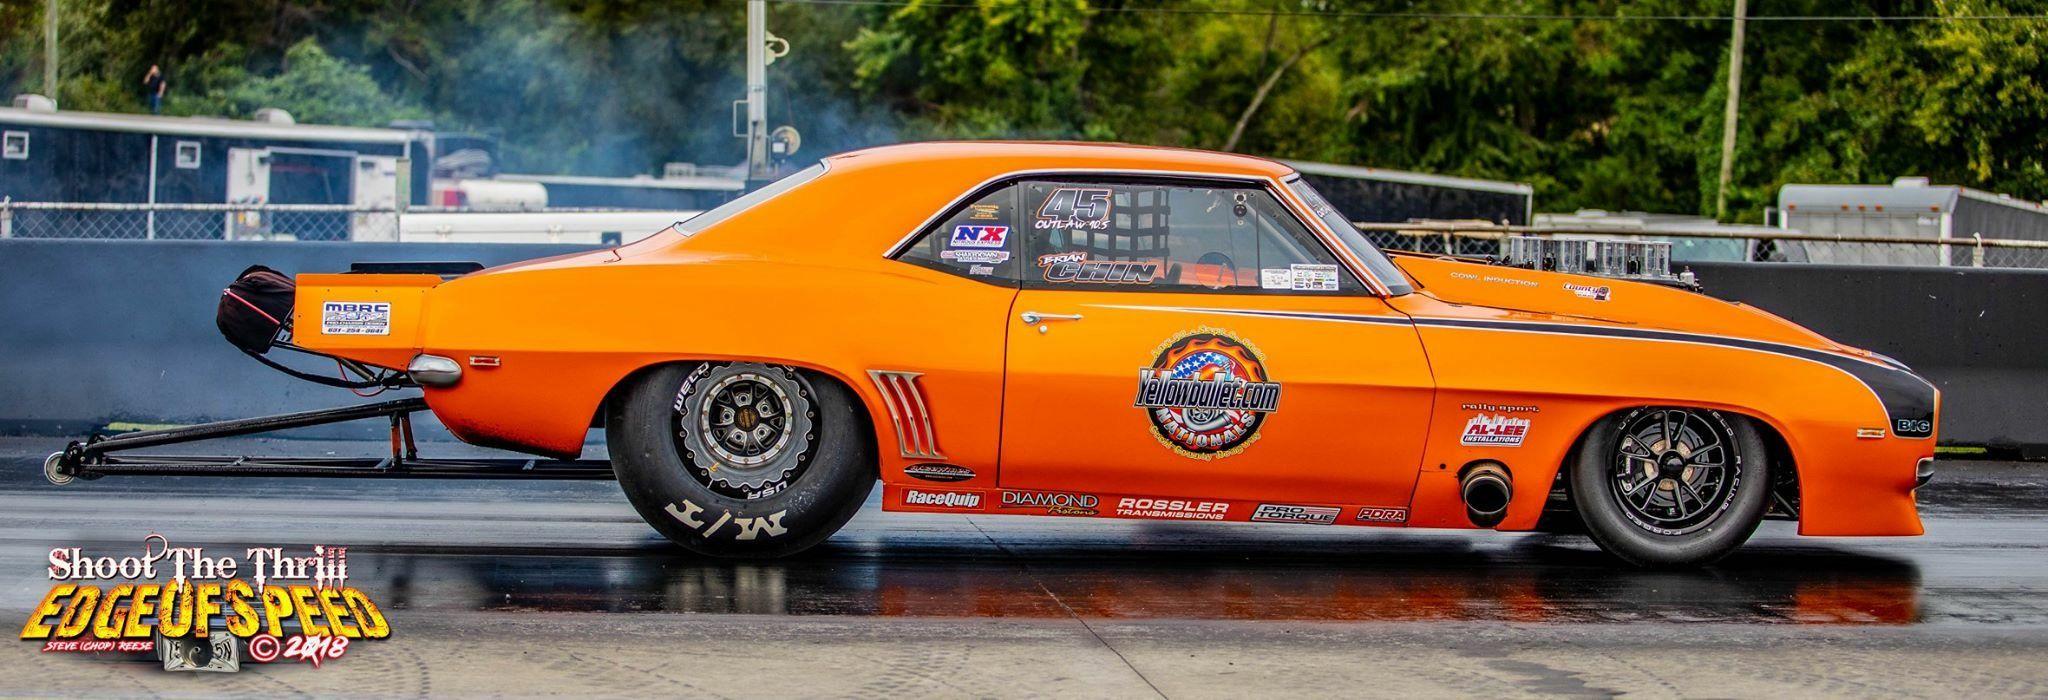 Pin By Speedworx On Drag Racing Nhra Car Model Drag Racing